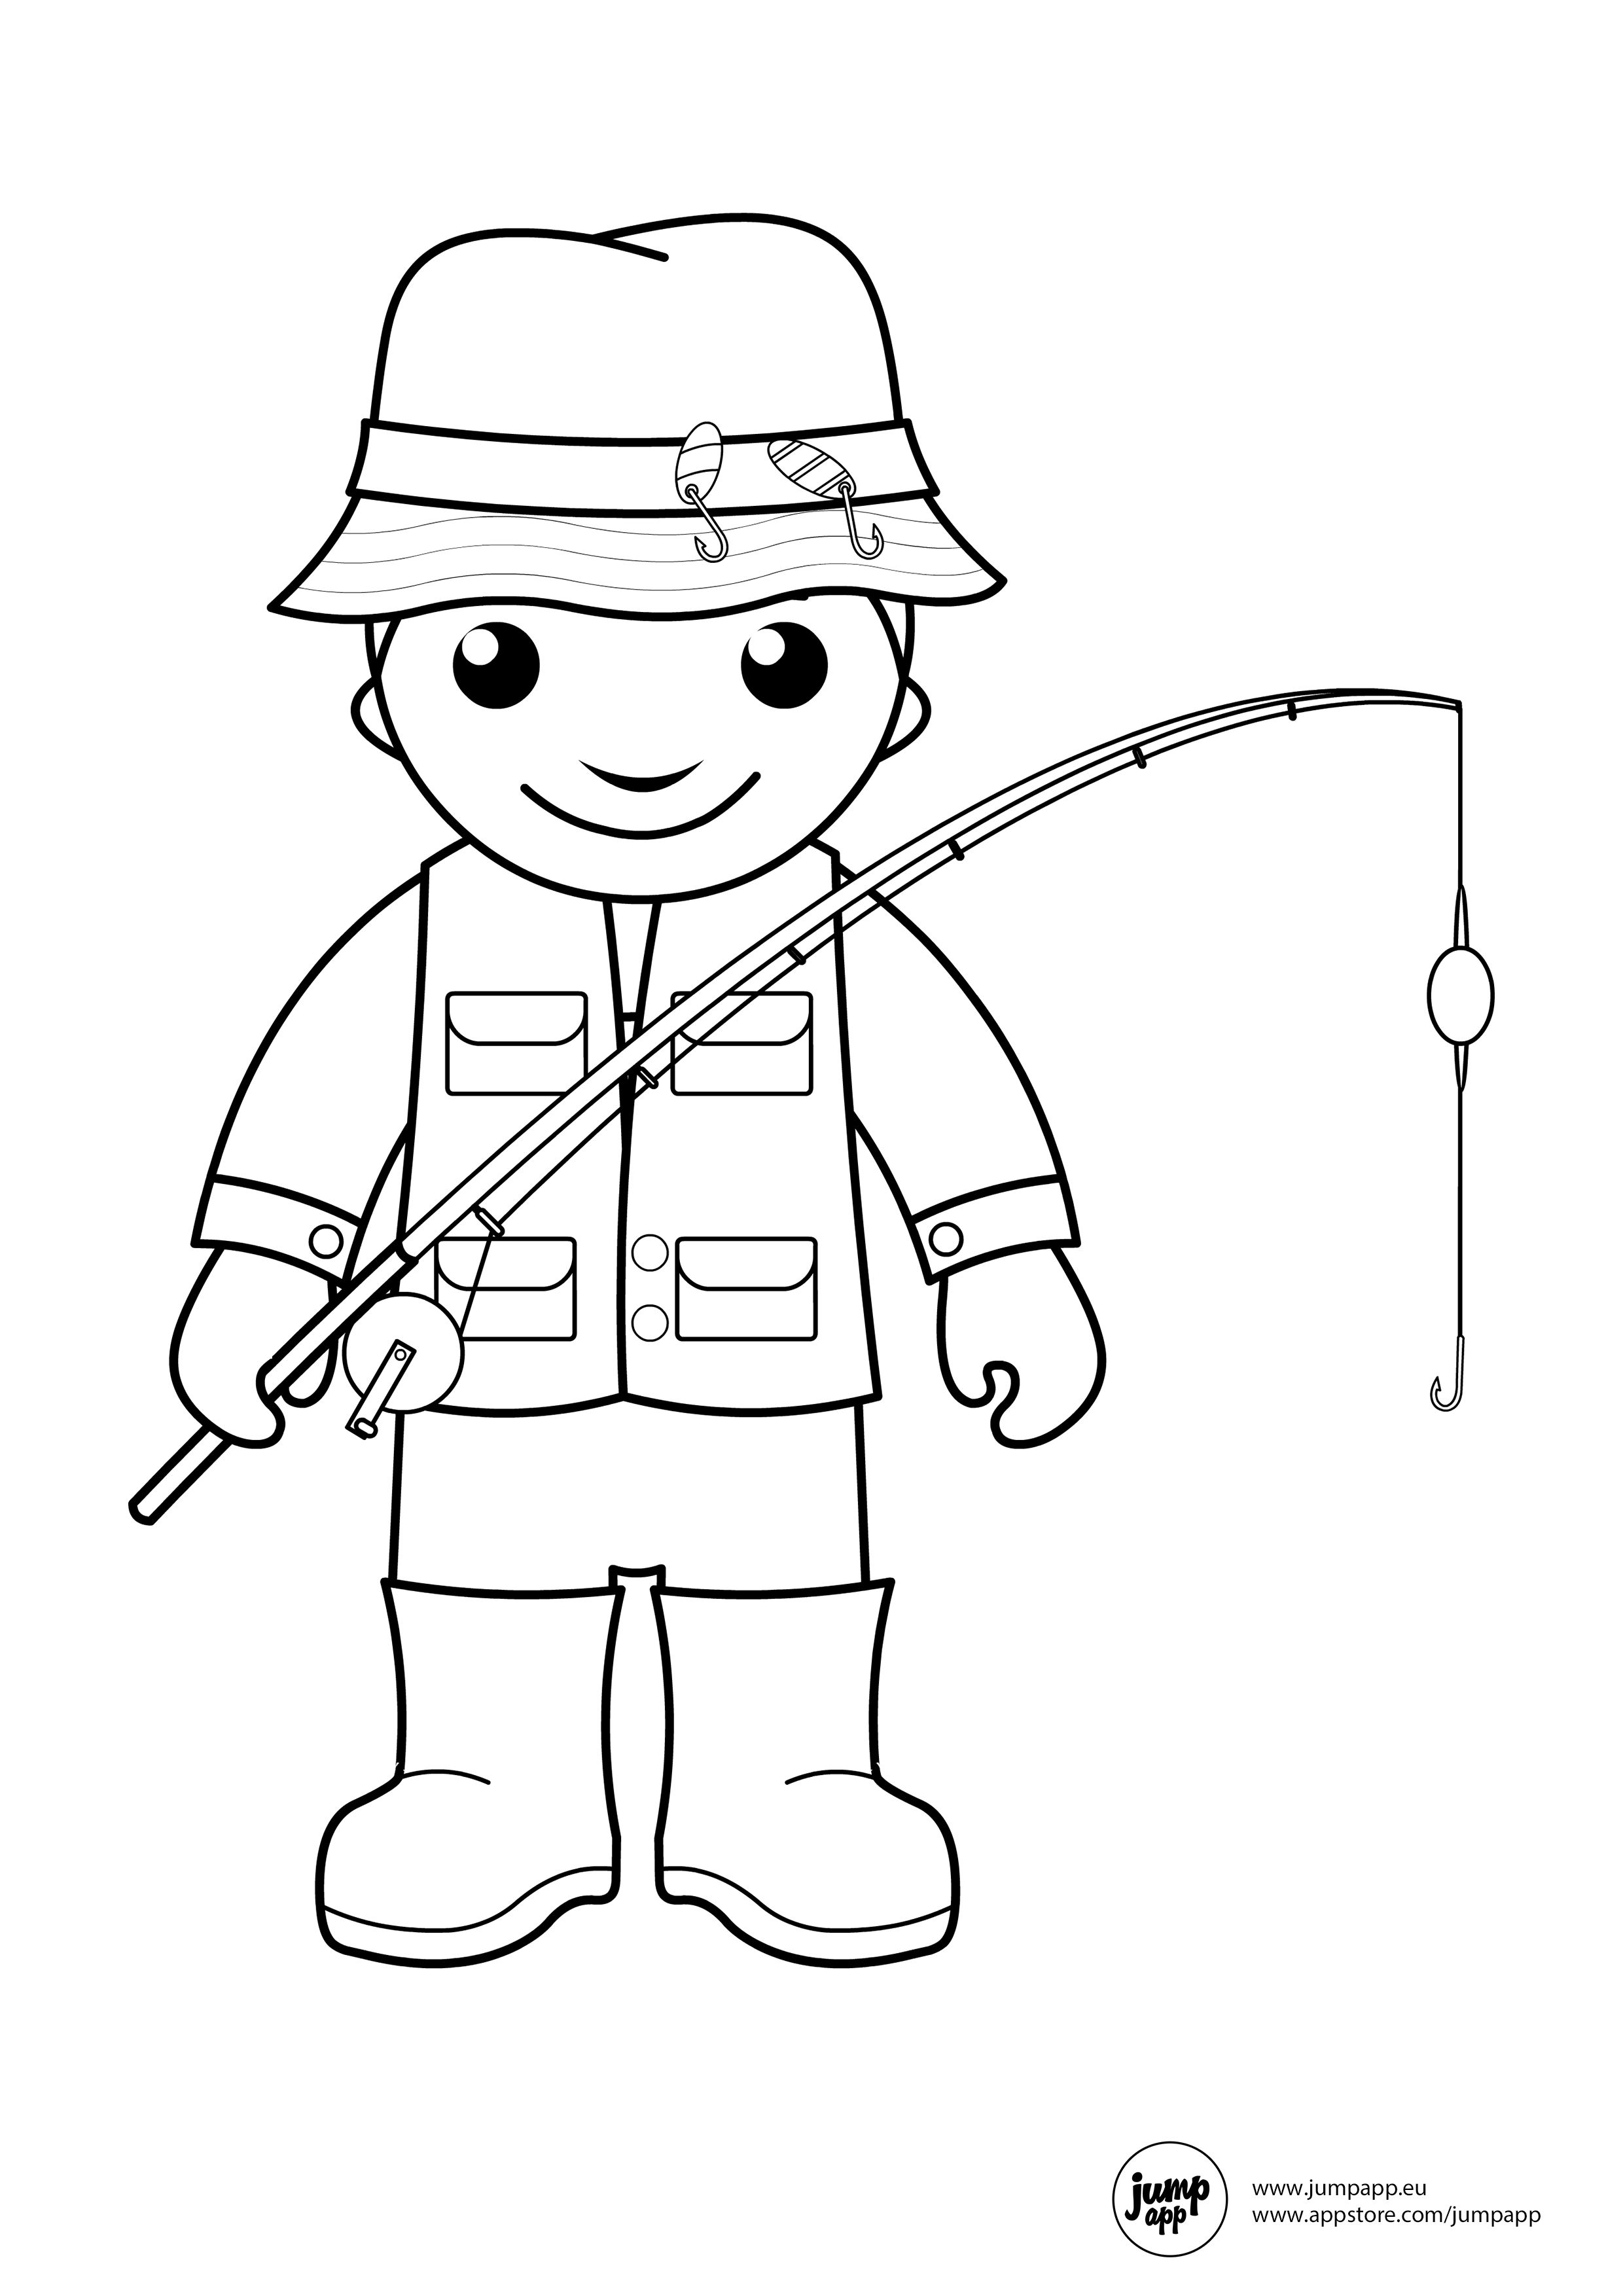 Fisherman Saad ص Fisherman Sayaad صياد Coloring Pages Train